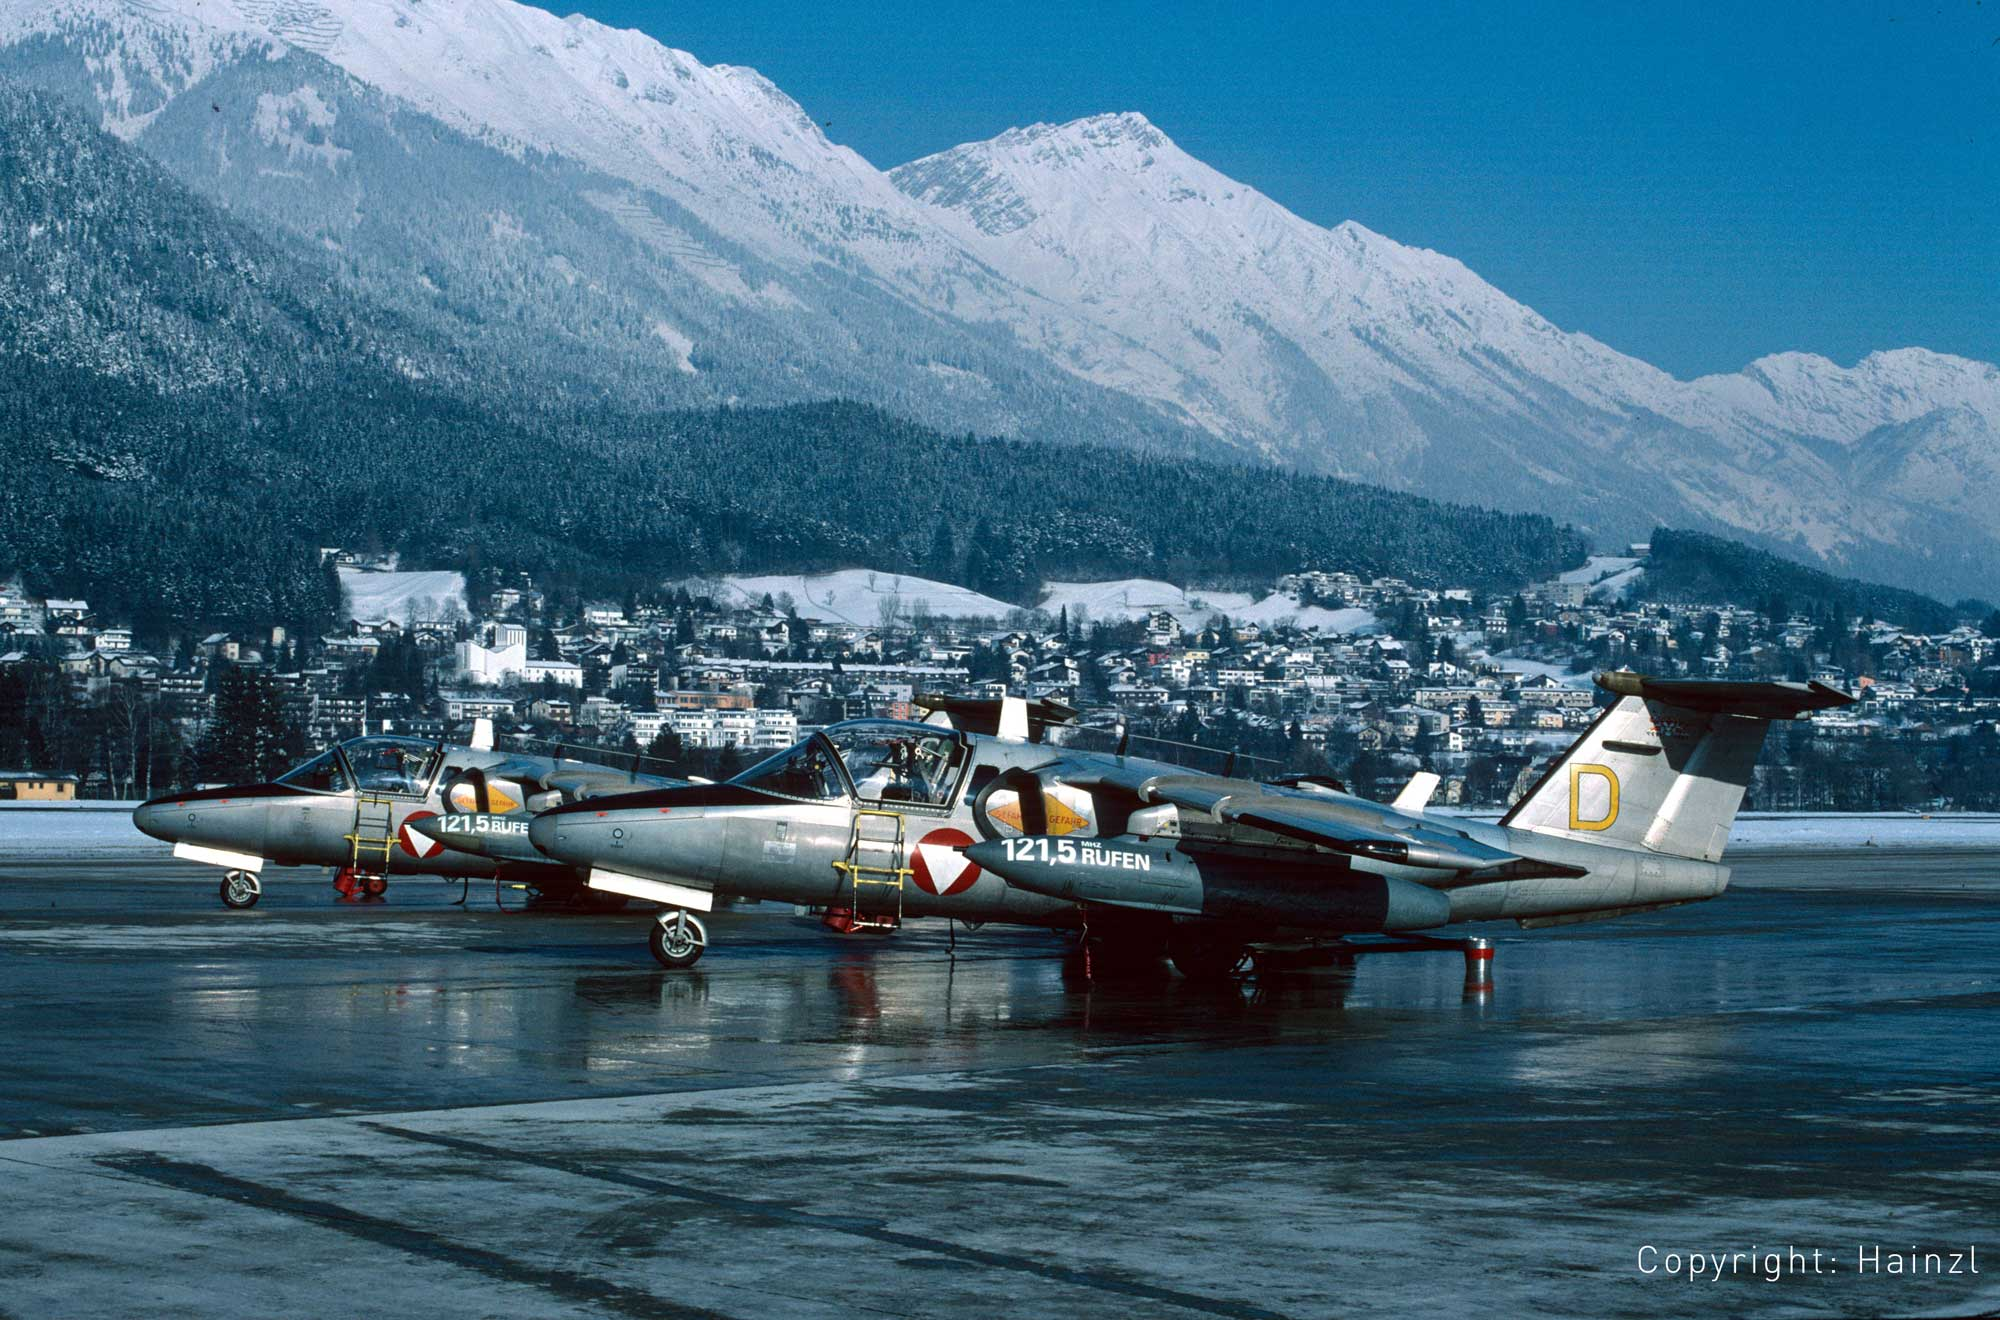 Saab 105-Hainzl